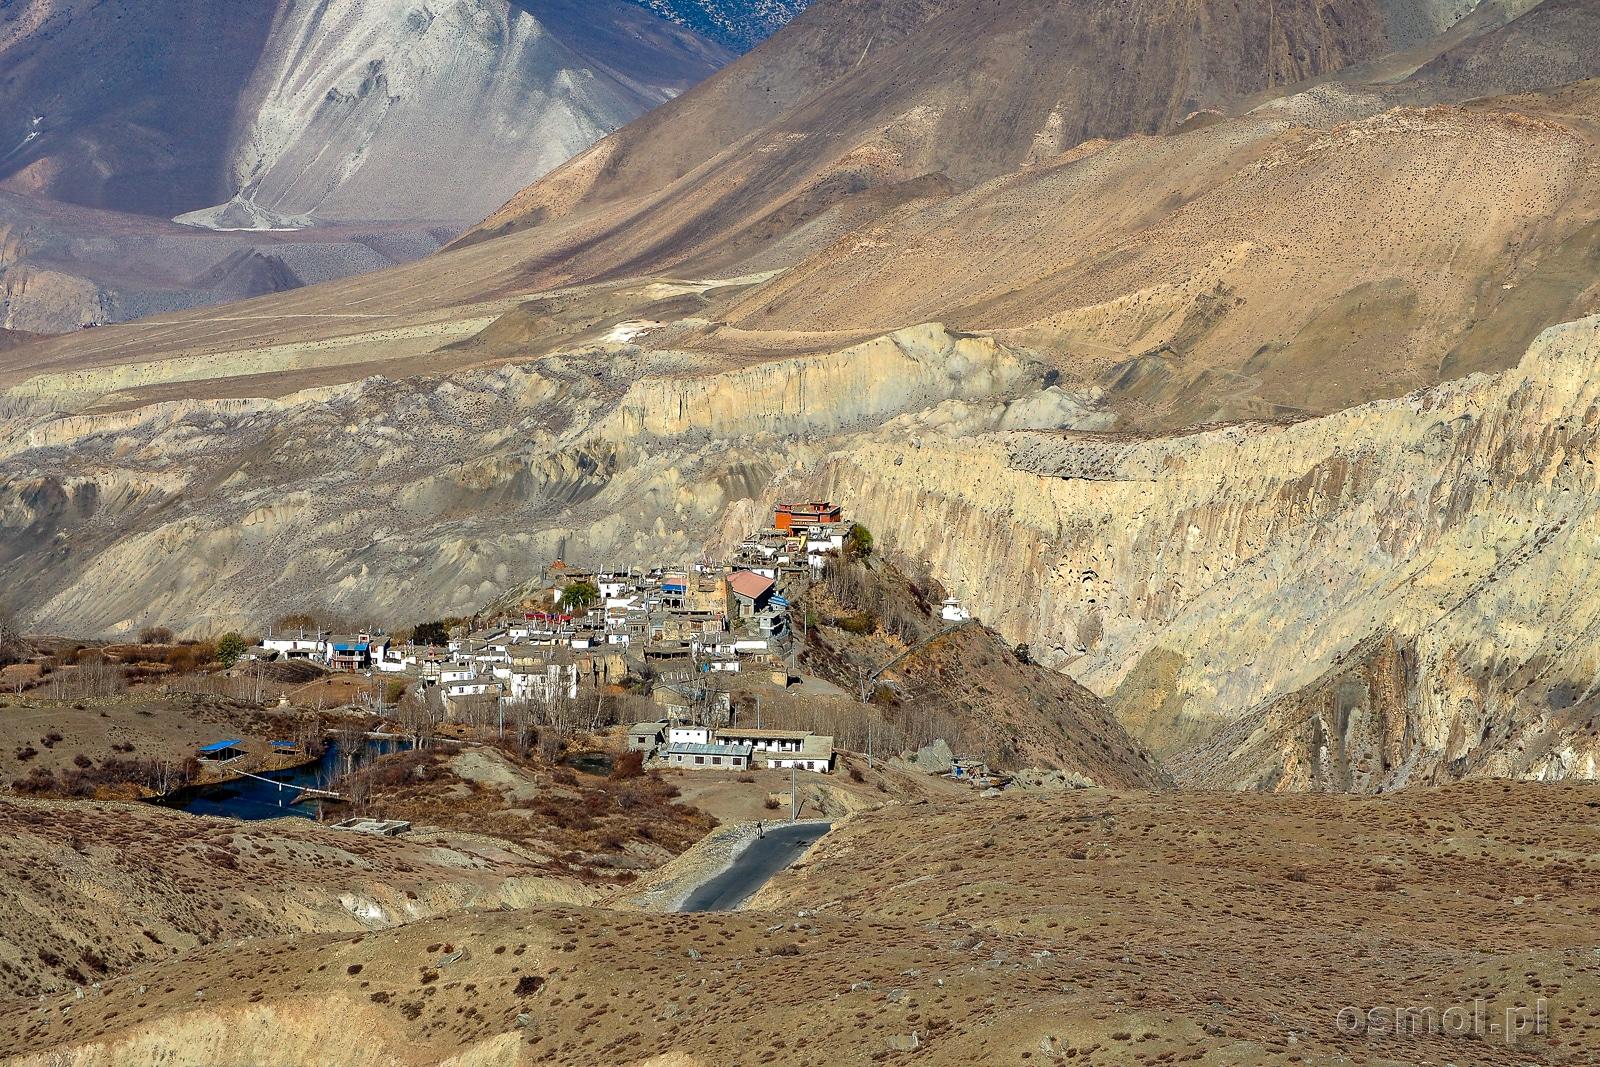 Widok na wioskę Jharkot